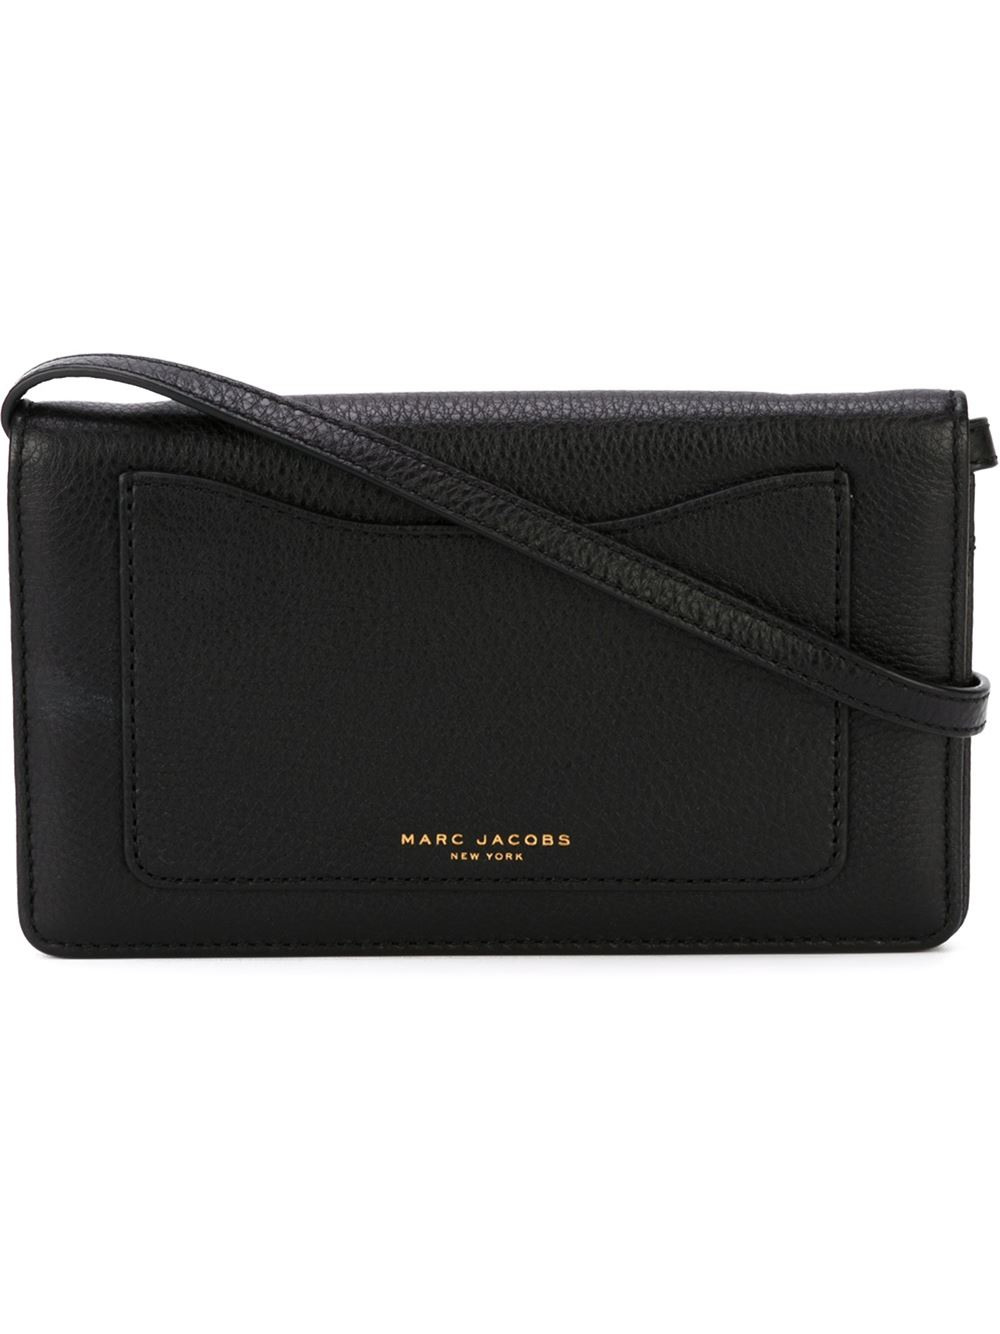 3536f8e7b1b0 Lyst - Marc Jacobs  recruit  Crossbody Bag in Black